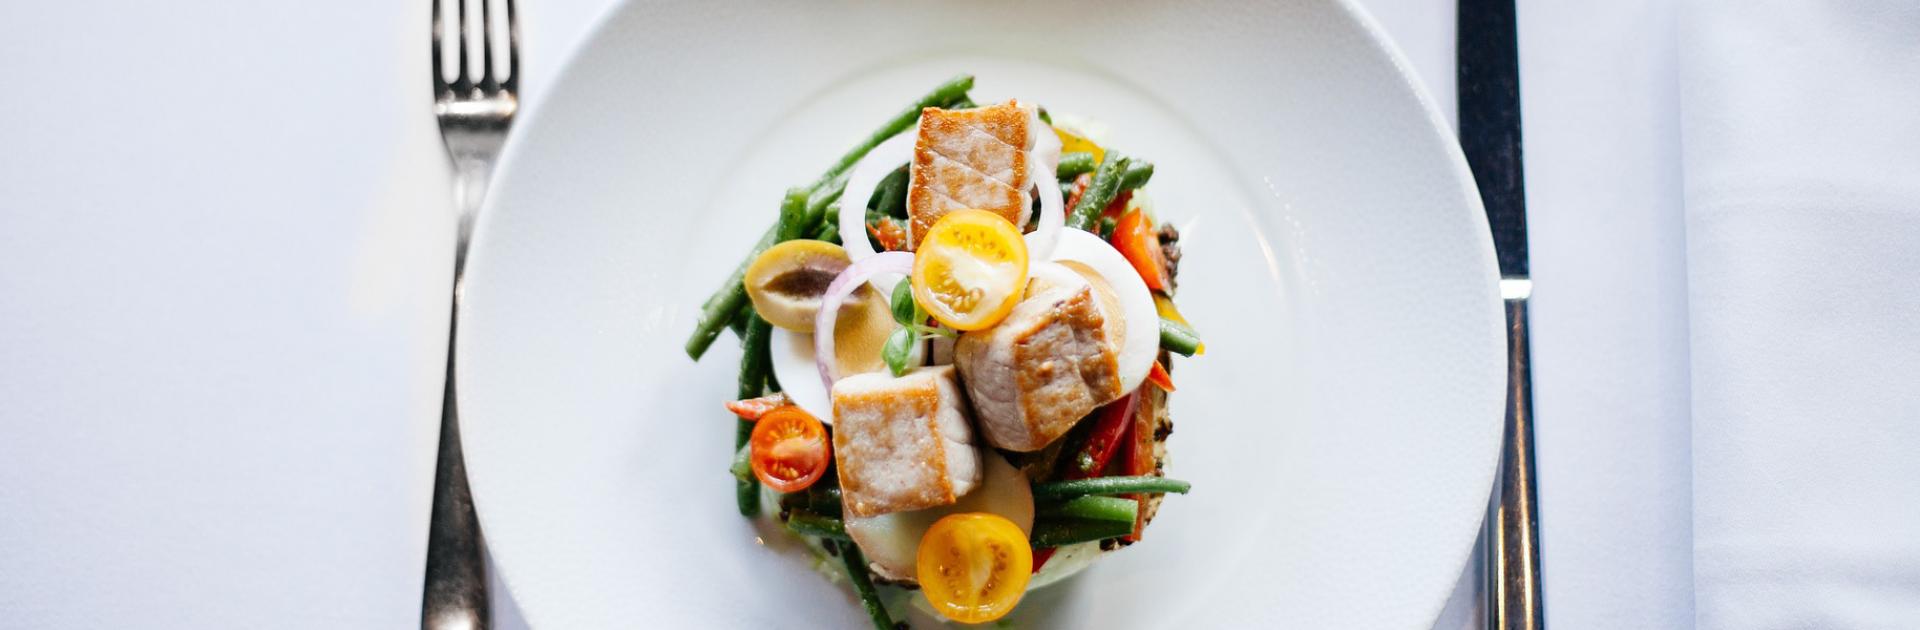 Salade Oosterse kip | Eigenhuis Keukens